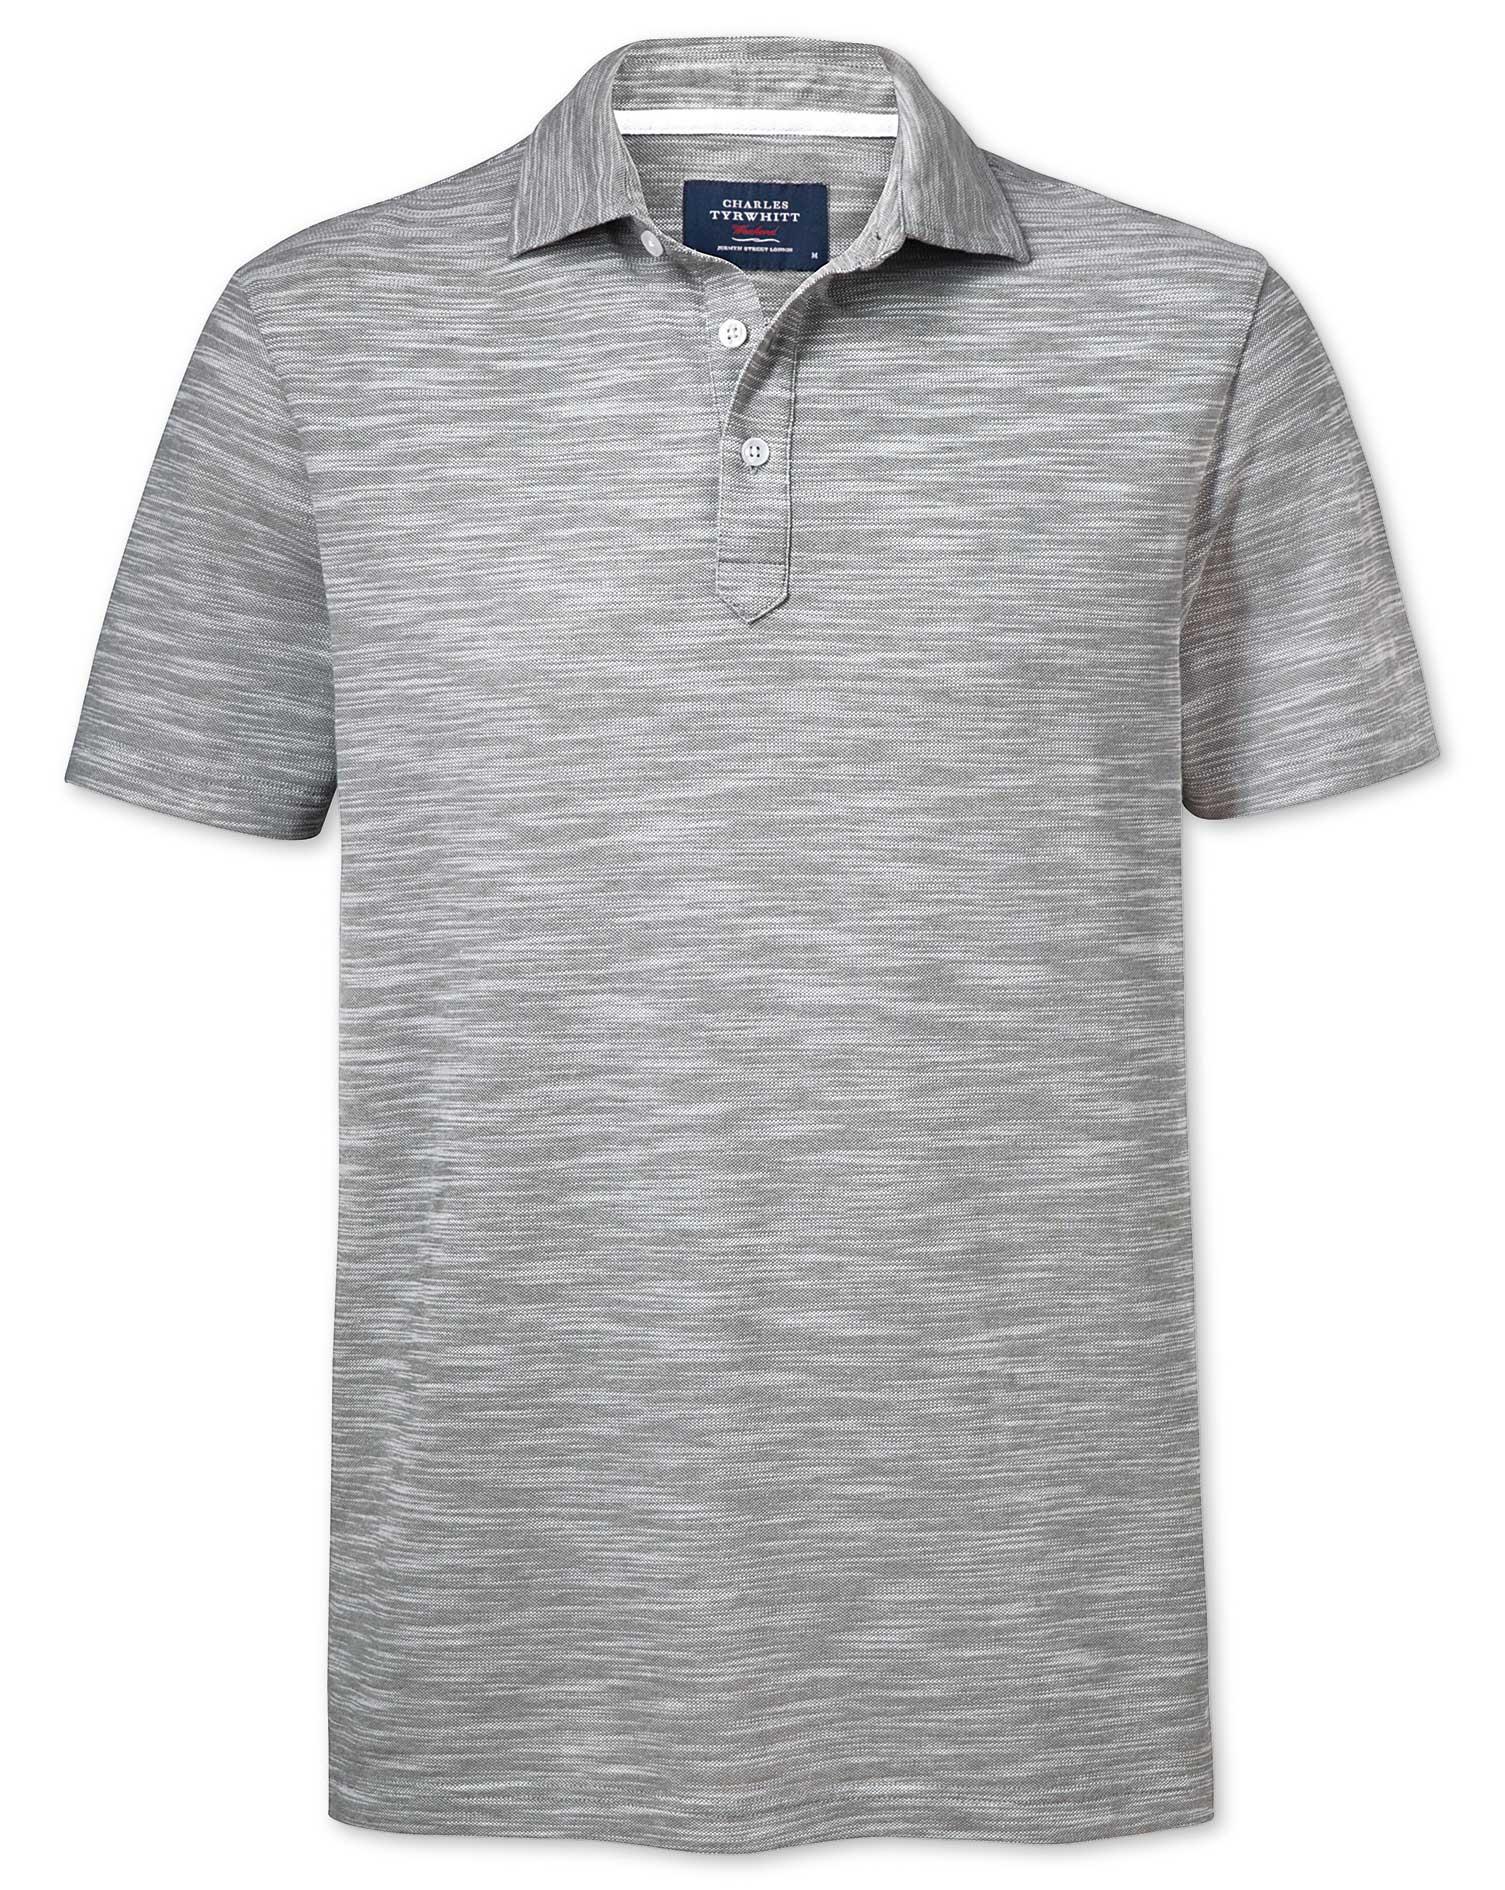 Grey Cotton Polo Size XS by Charles Tyrwhitt